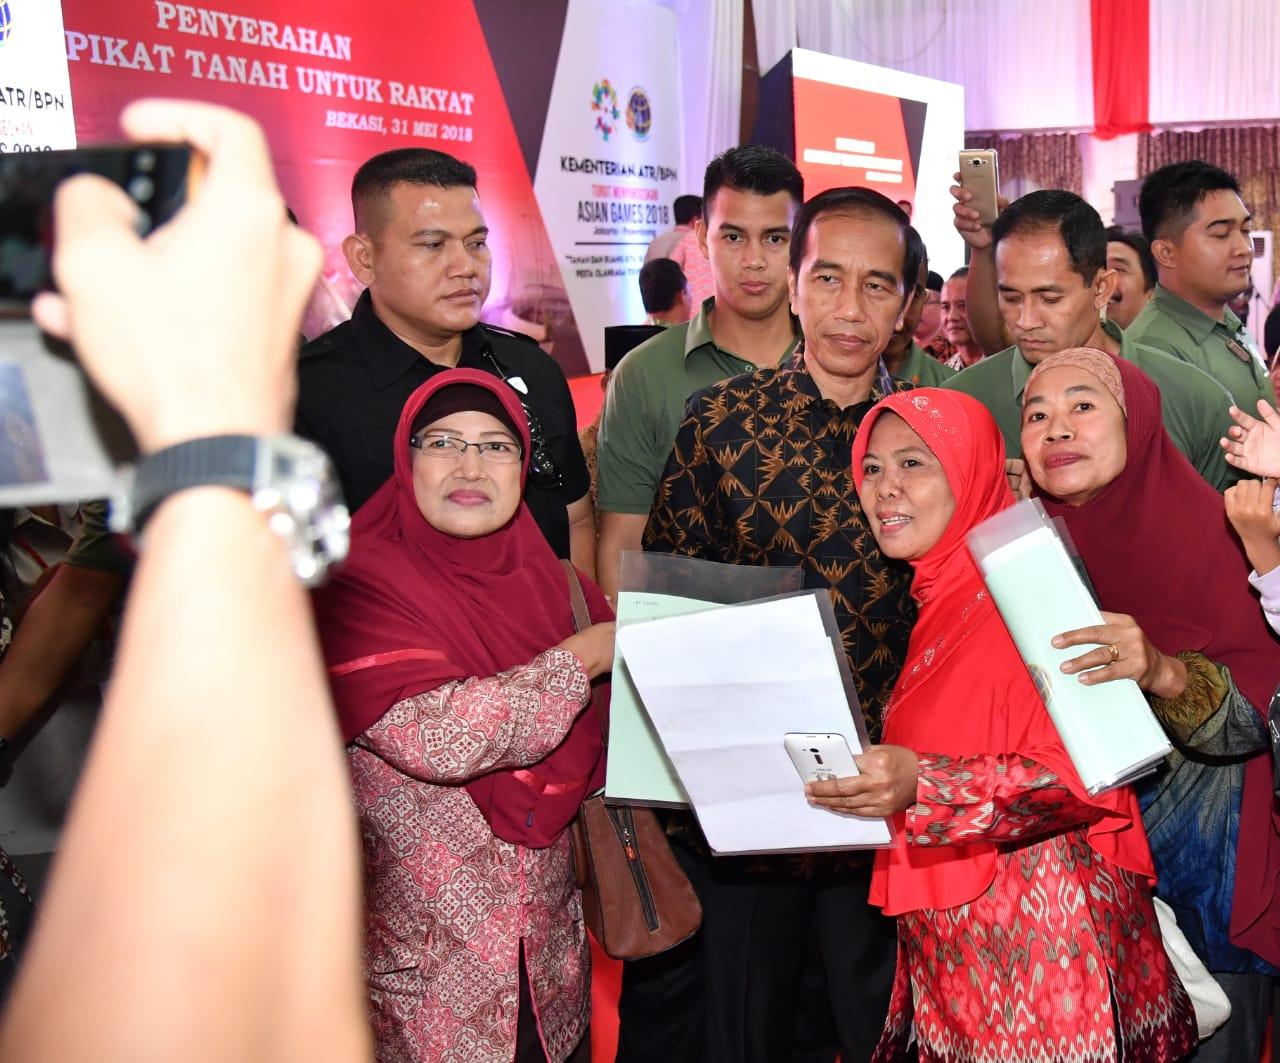 Presiden Serahkan 3.026 Sertifikat kepada Warga Bekasi dan Jakarta Timur